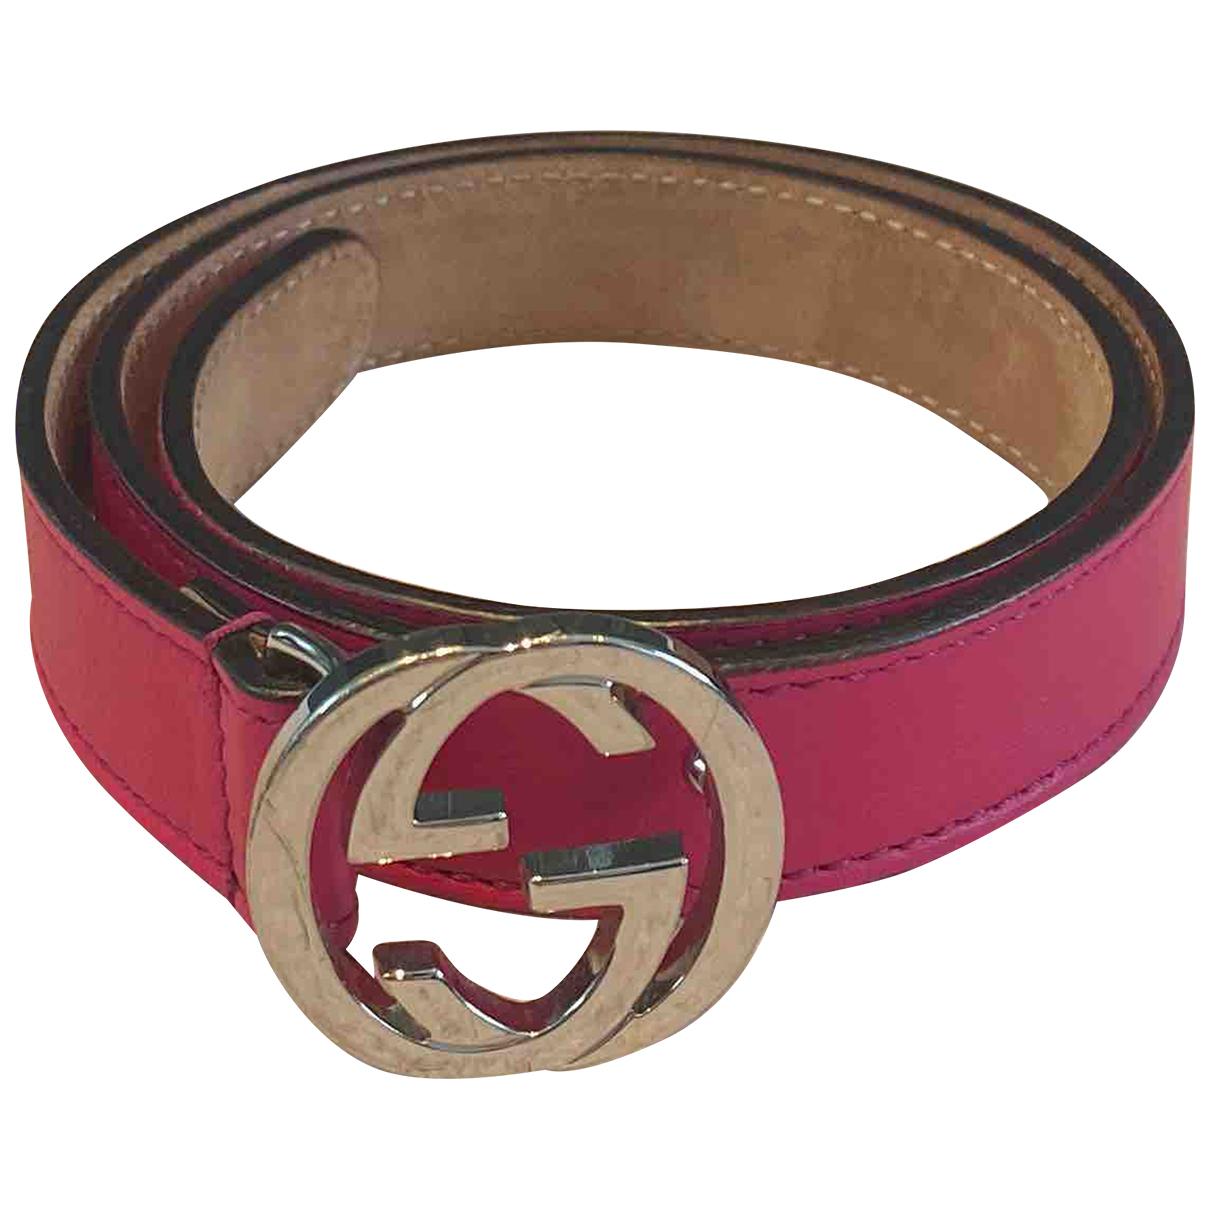 Gucci N Pink Leather belt.Suspenders for Kids N